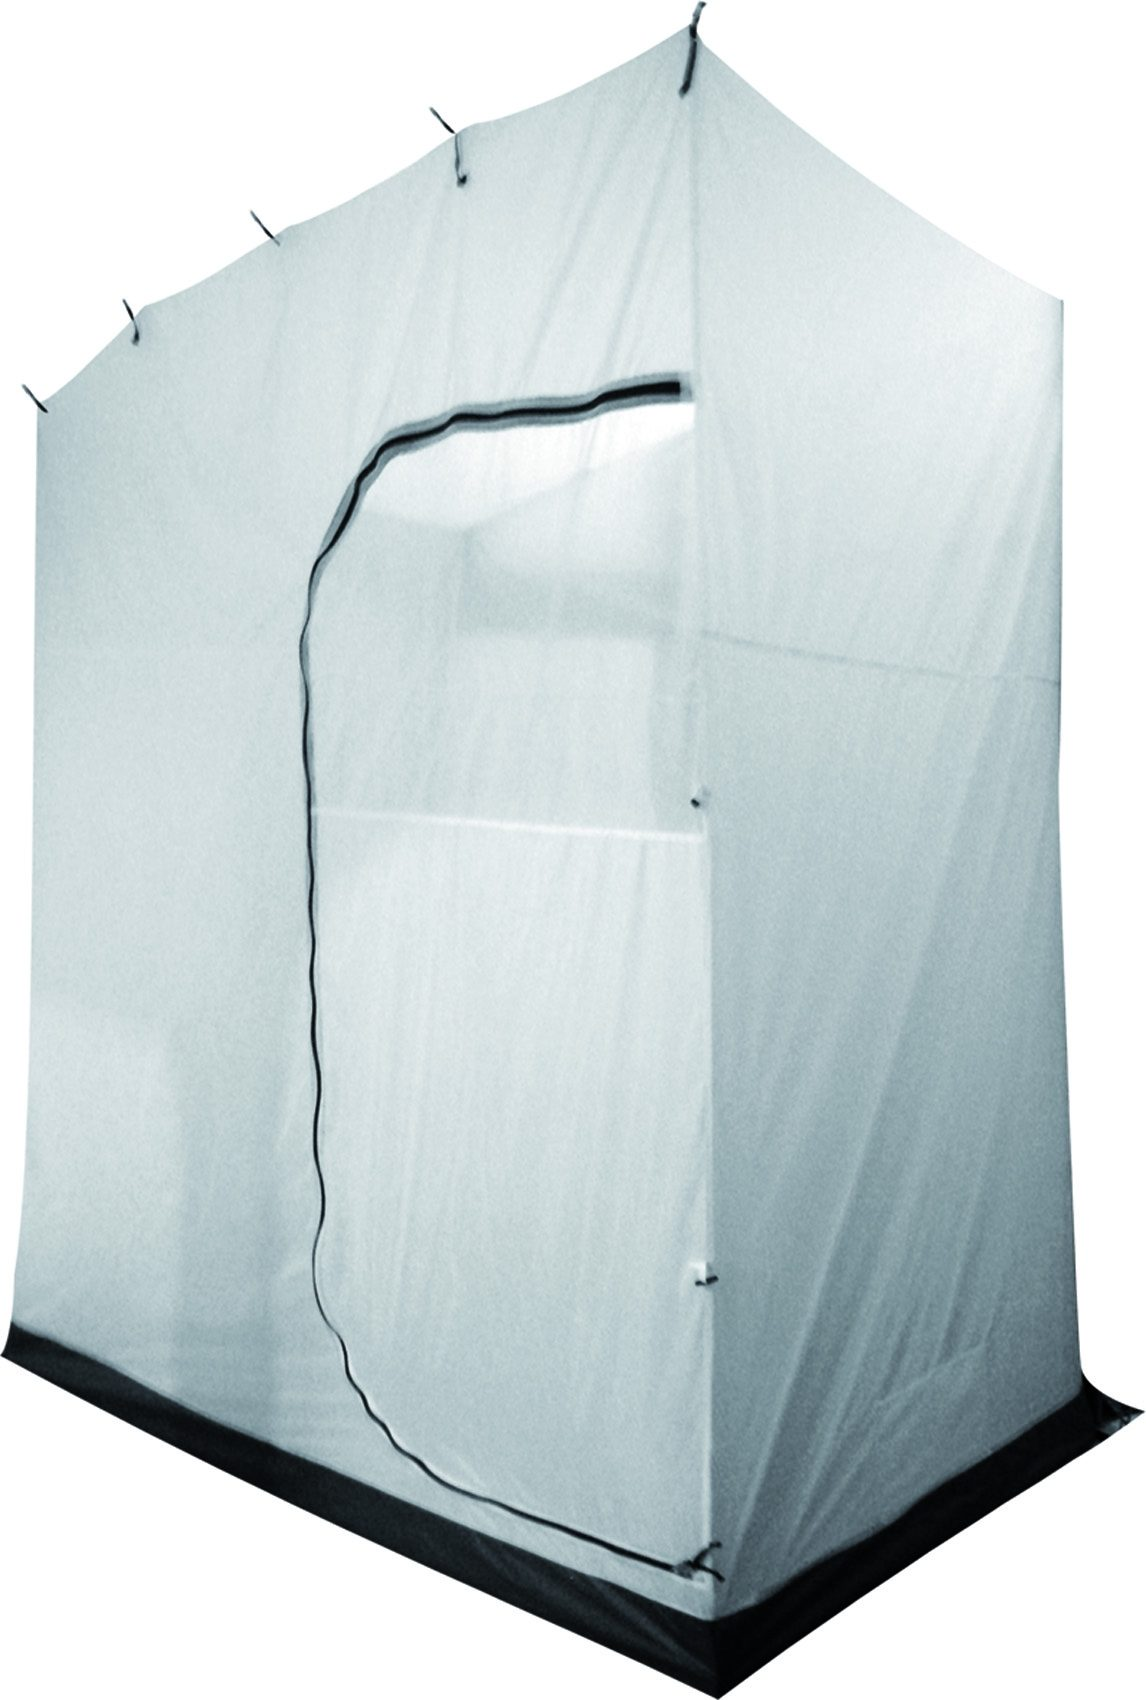 Cabina per Tenda Trouper